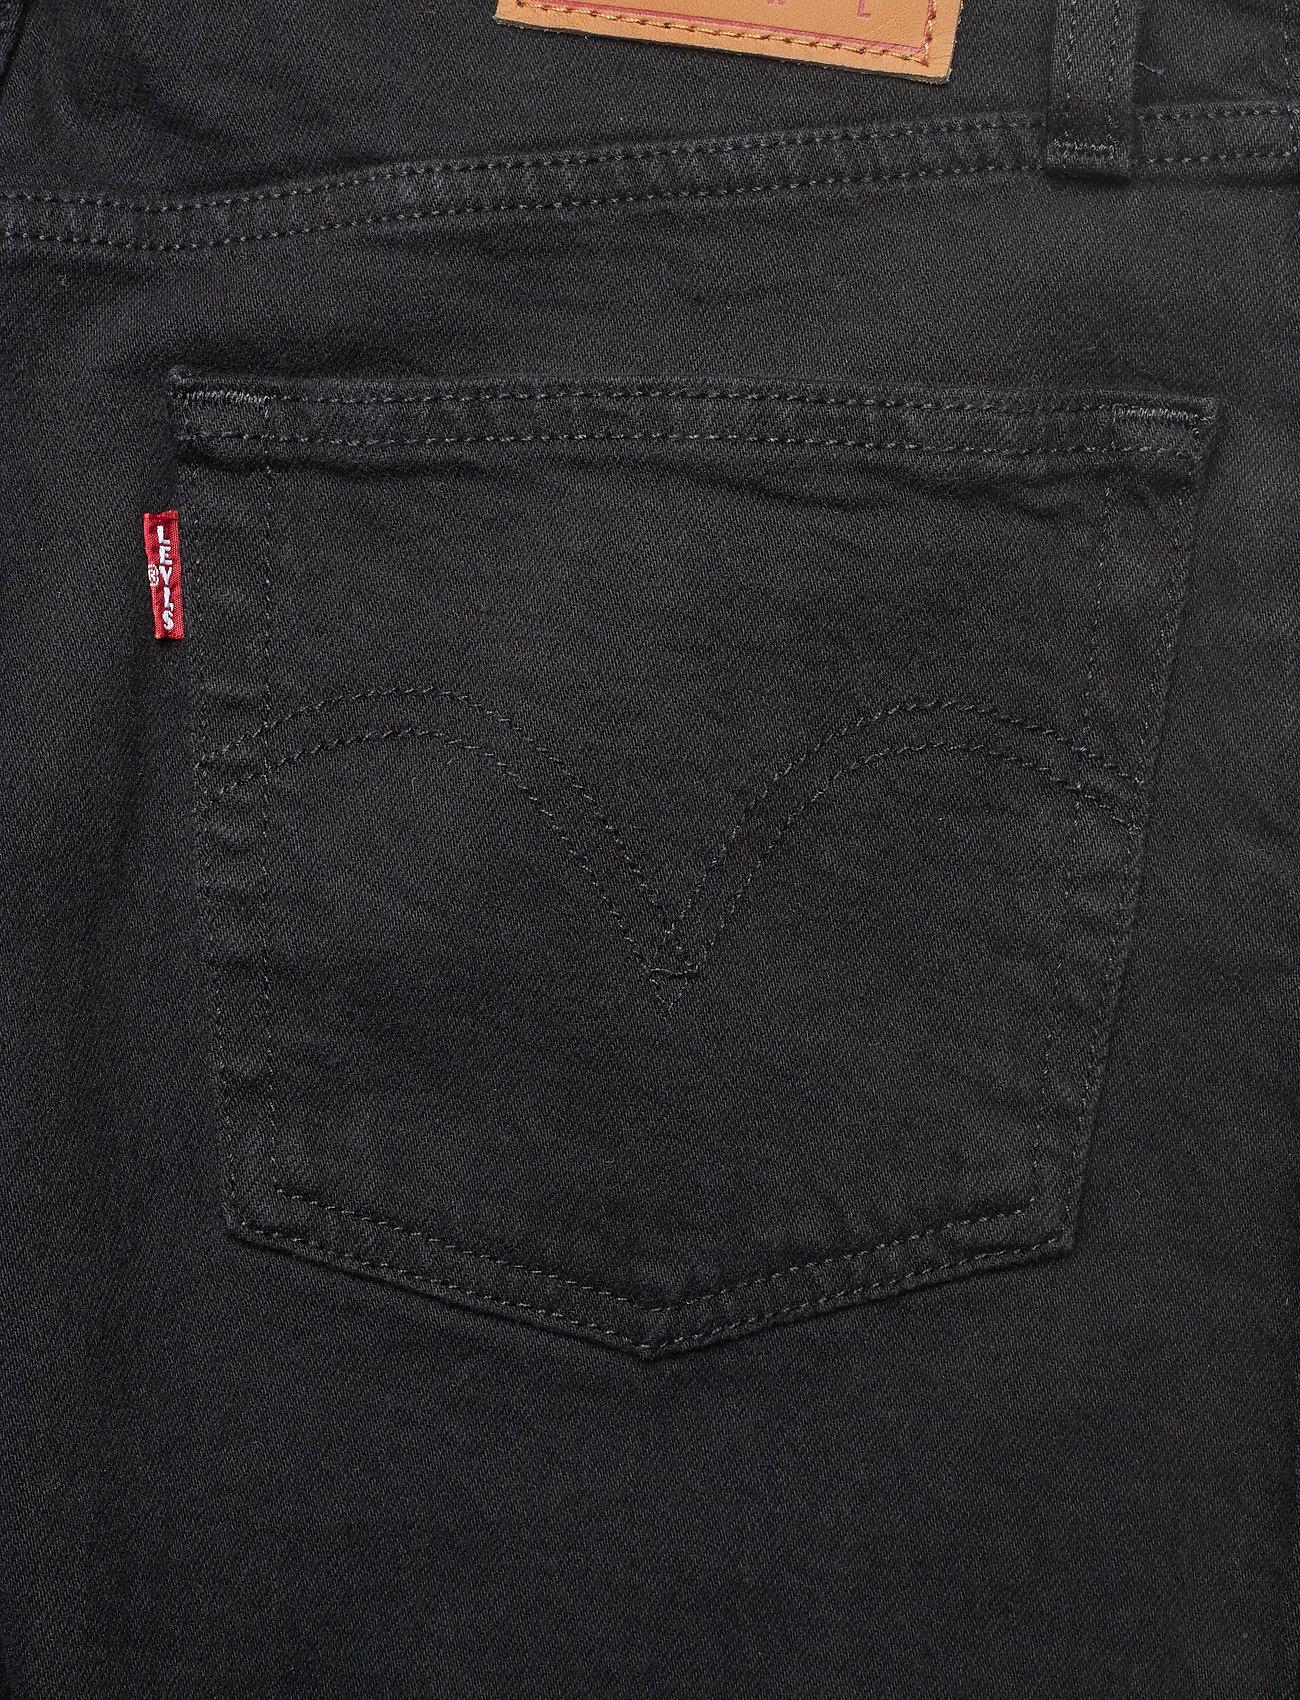 LEVI´S Women - 501 CROP BLACK SPROUT - raka jeans - blacks - 4